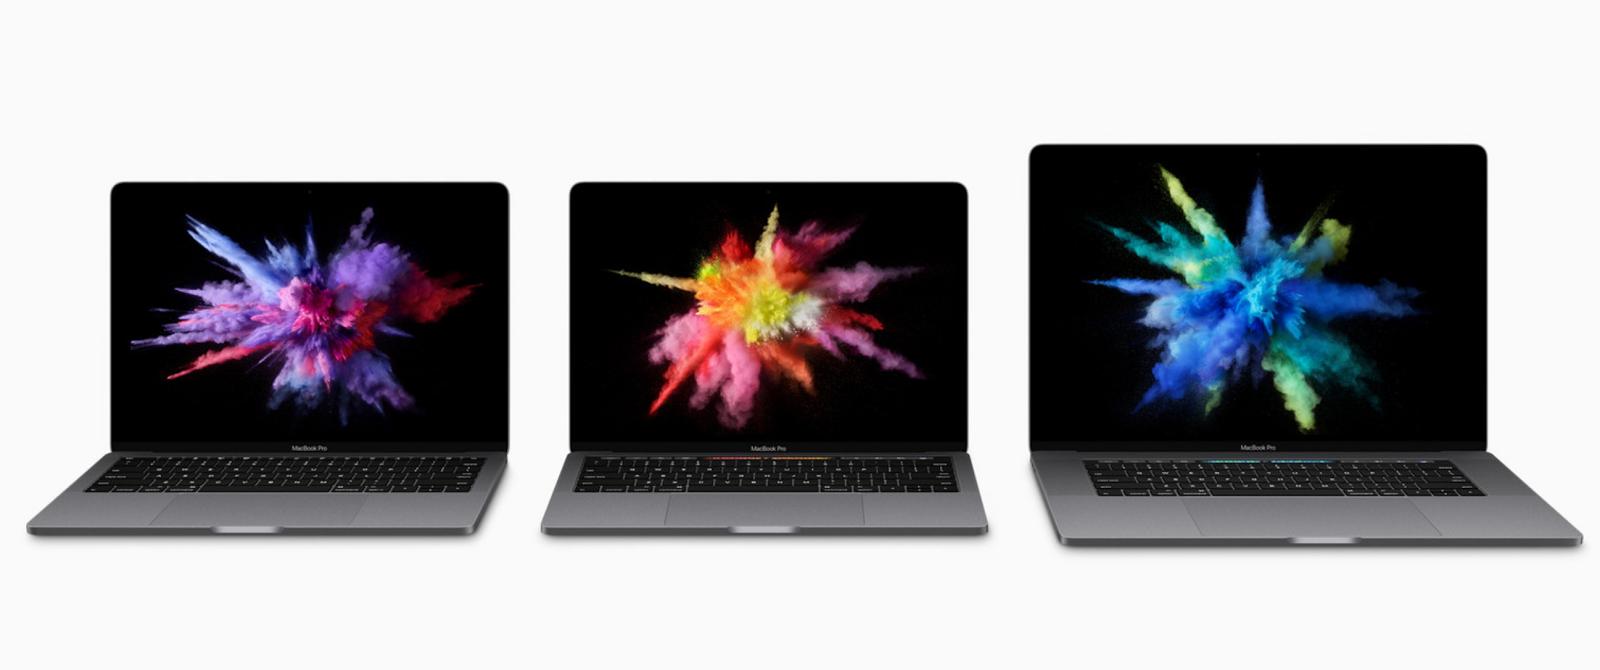 Win a new Macbook Pro International Giveaway